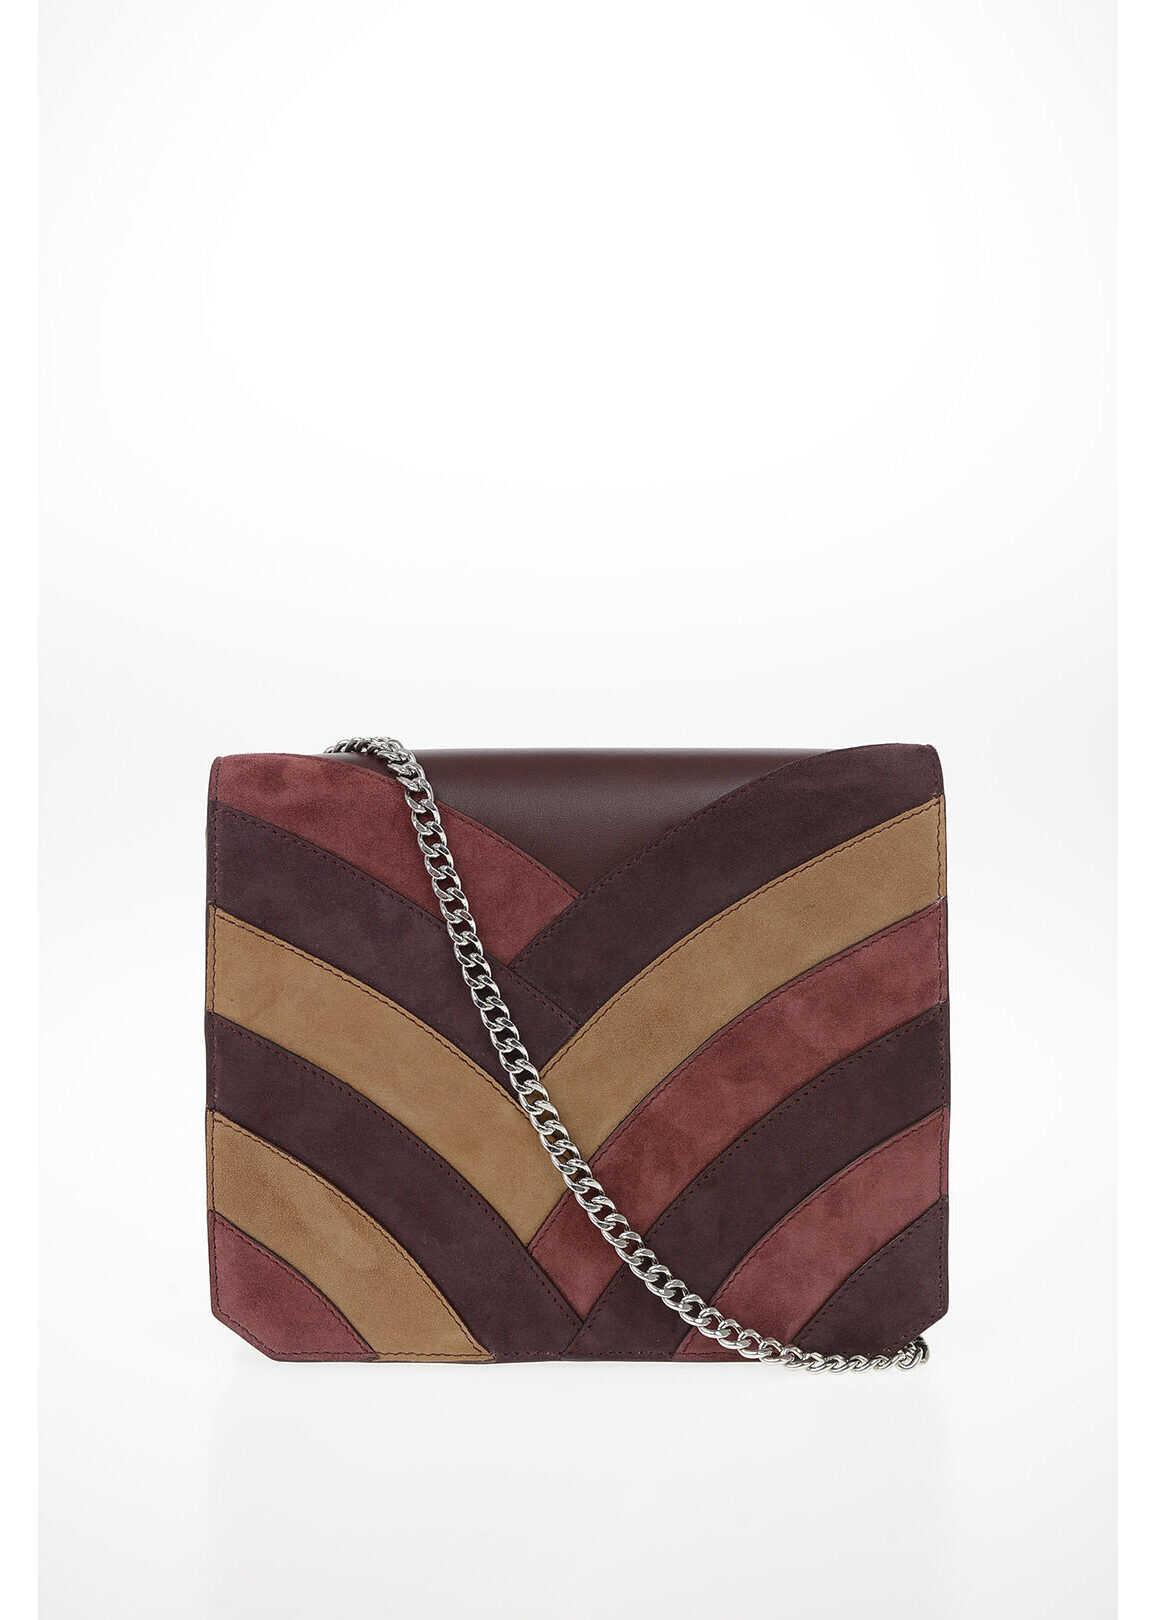 Just Cavalli Suede Leather Shoulder Bag BURGUNDY imagine b-mall.ro